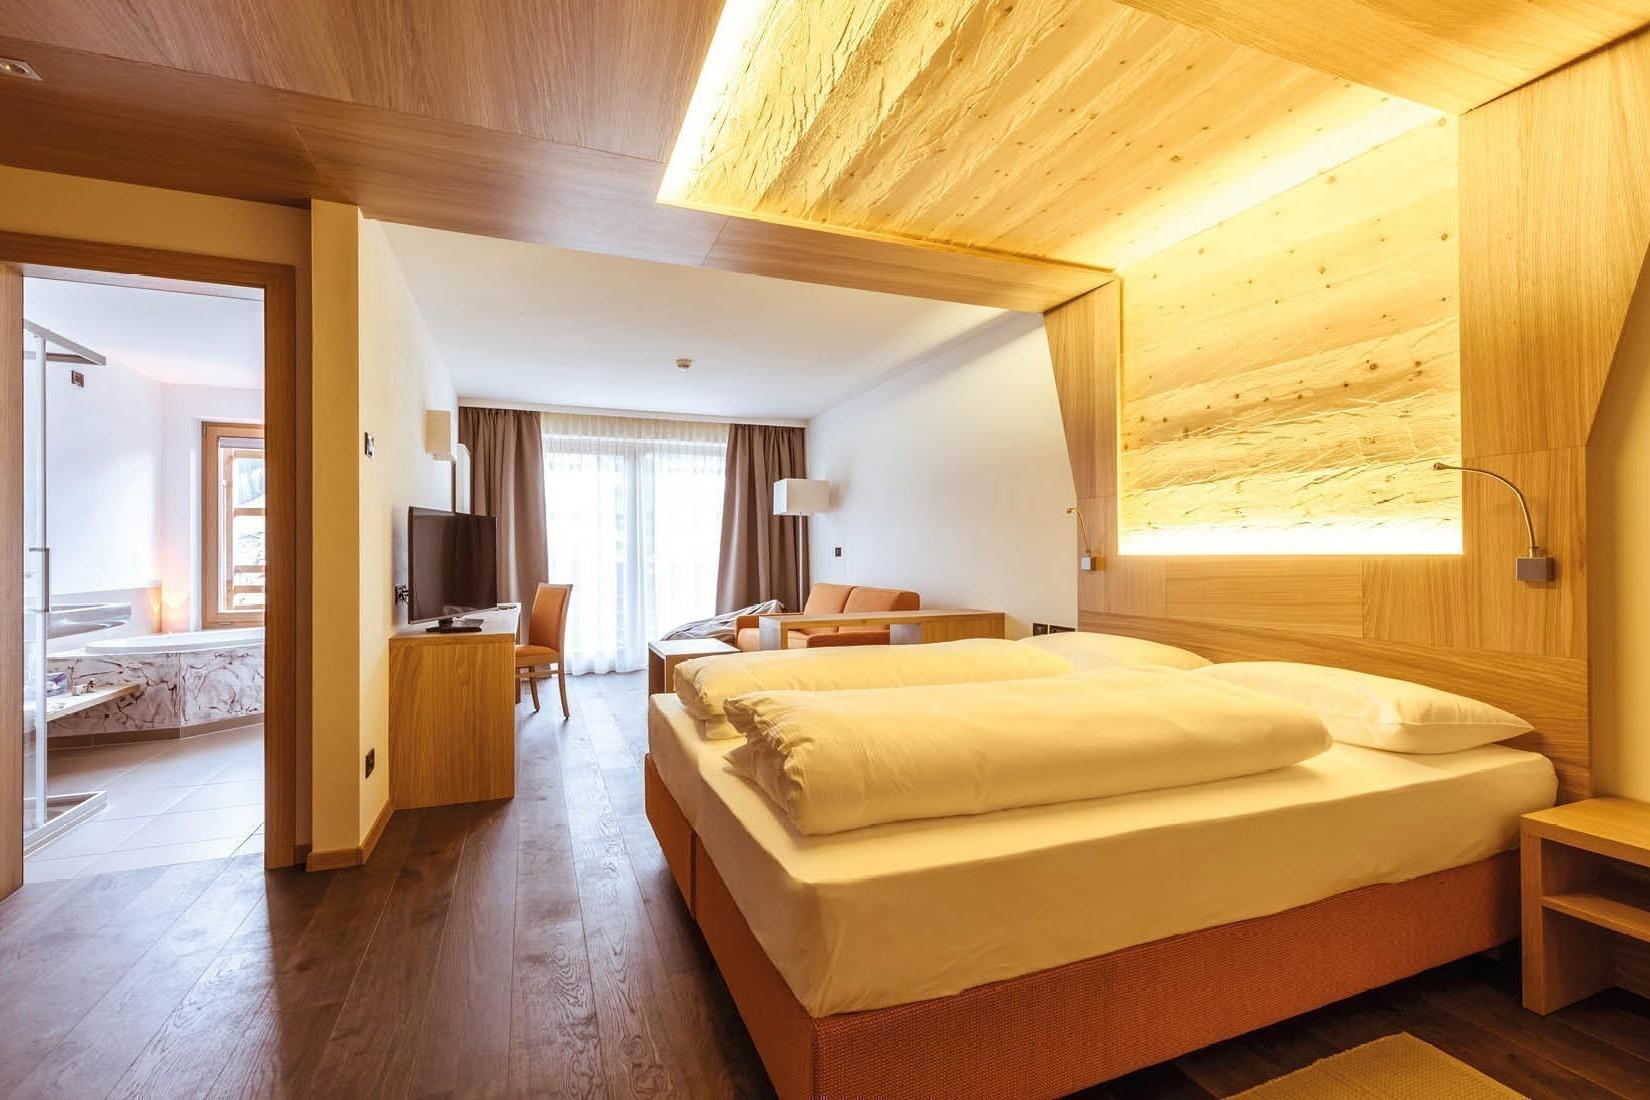 hotels/hotel_26/image_5.jpg